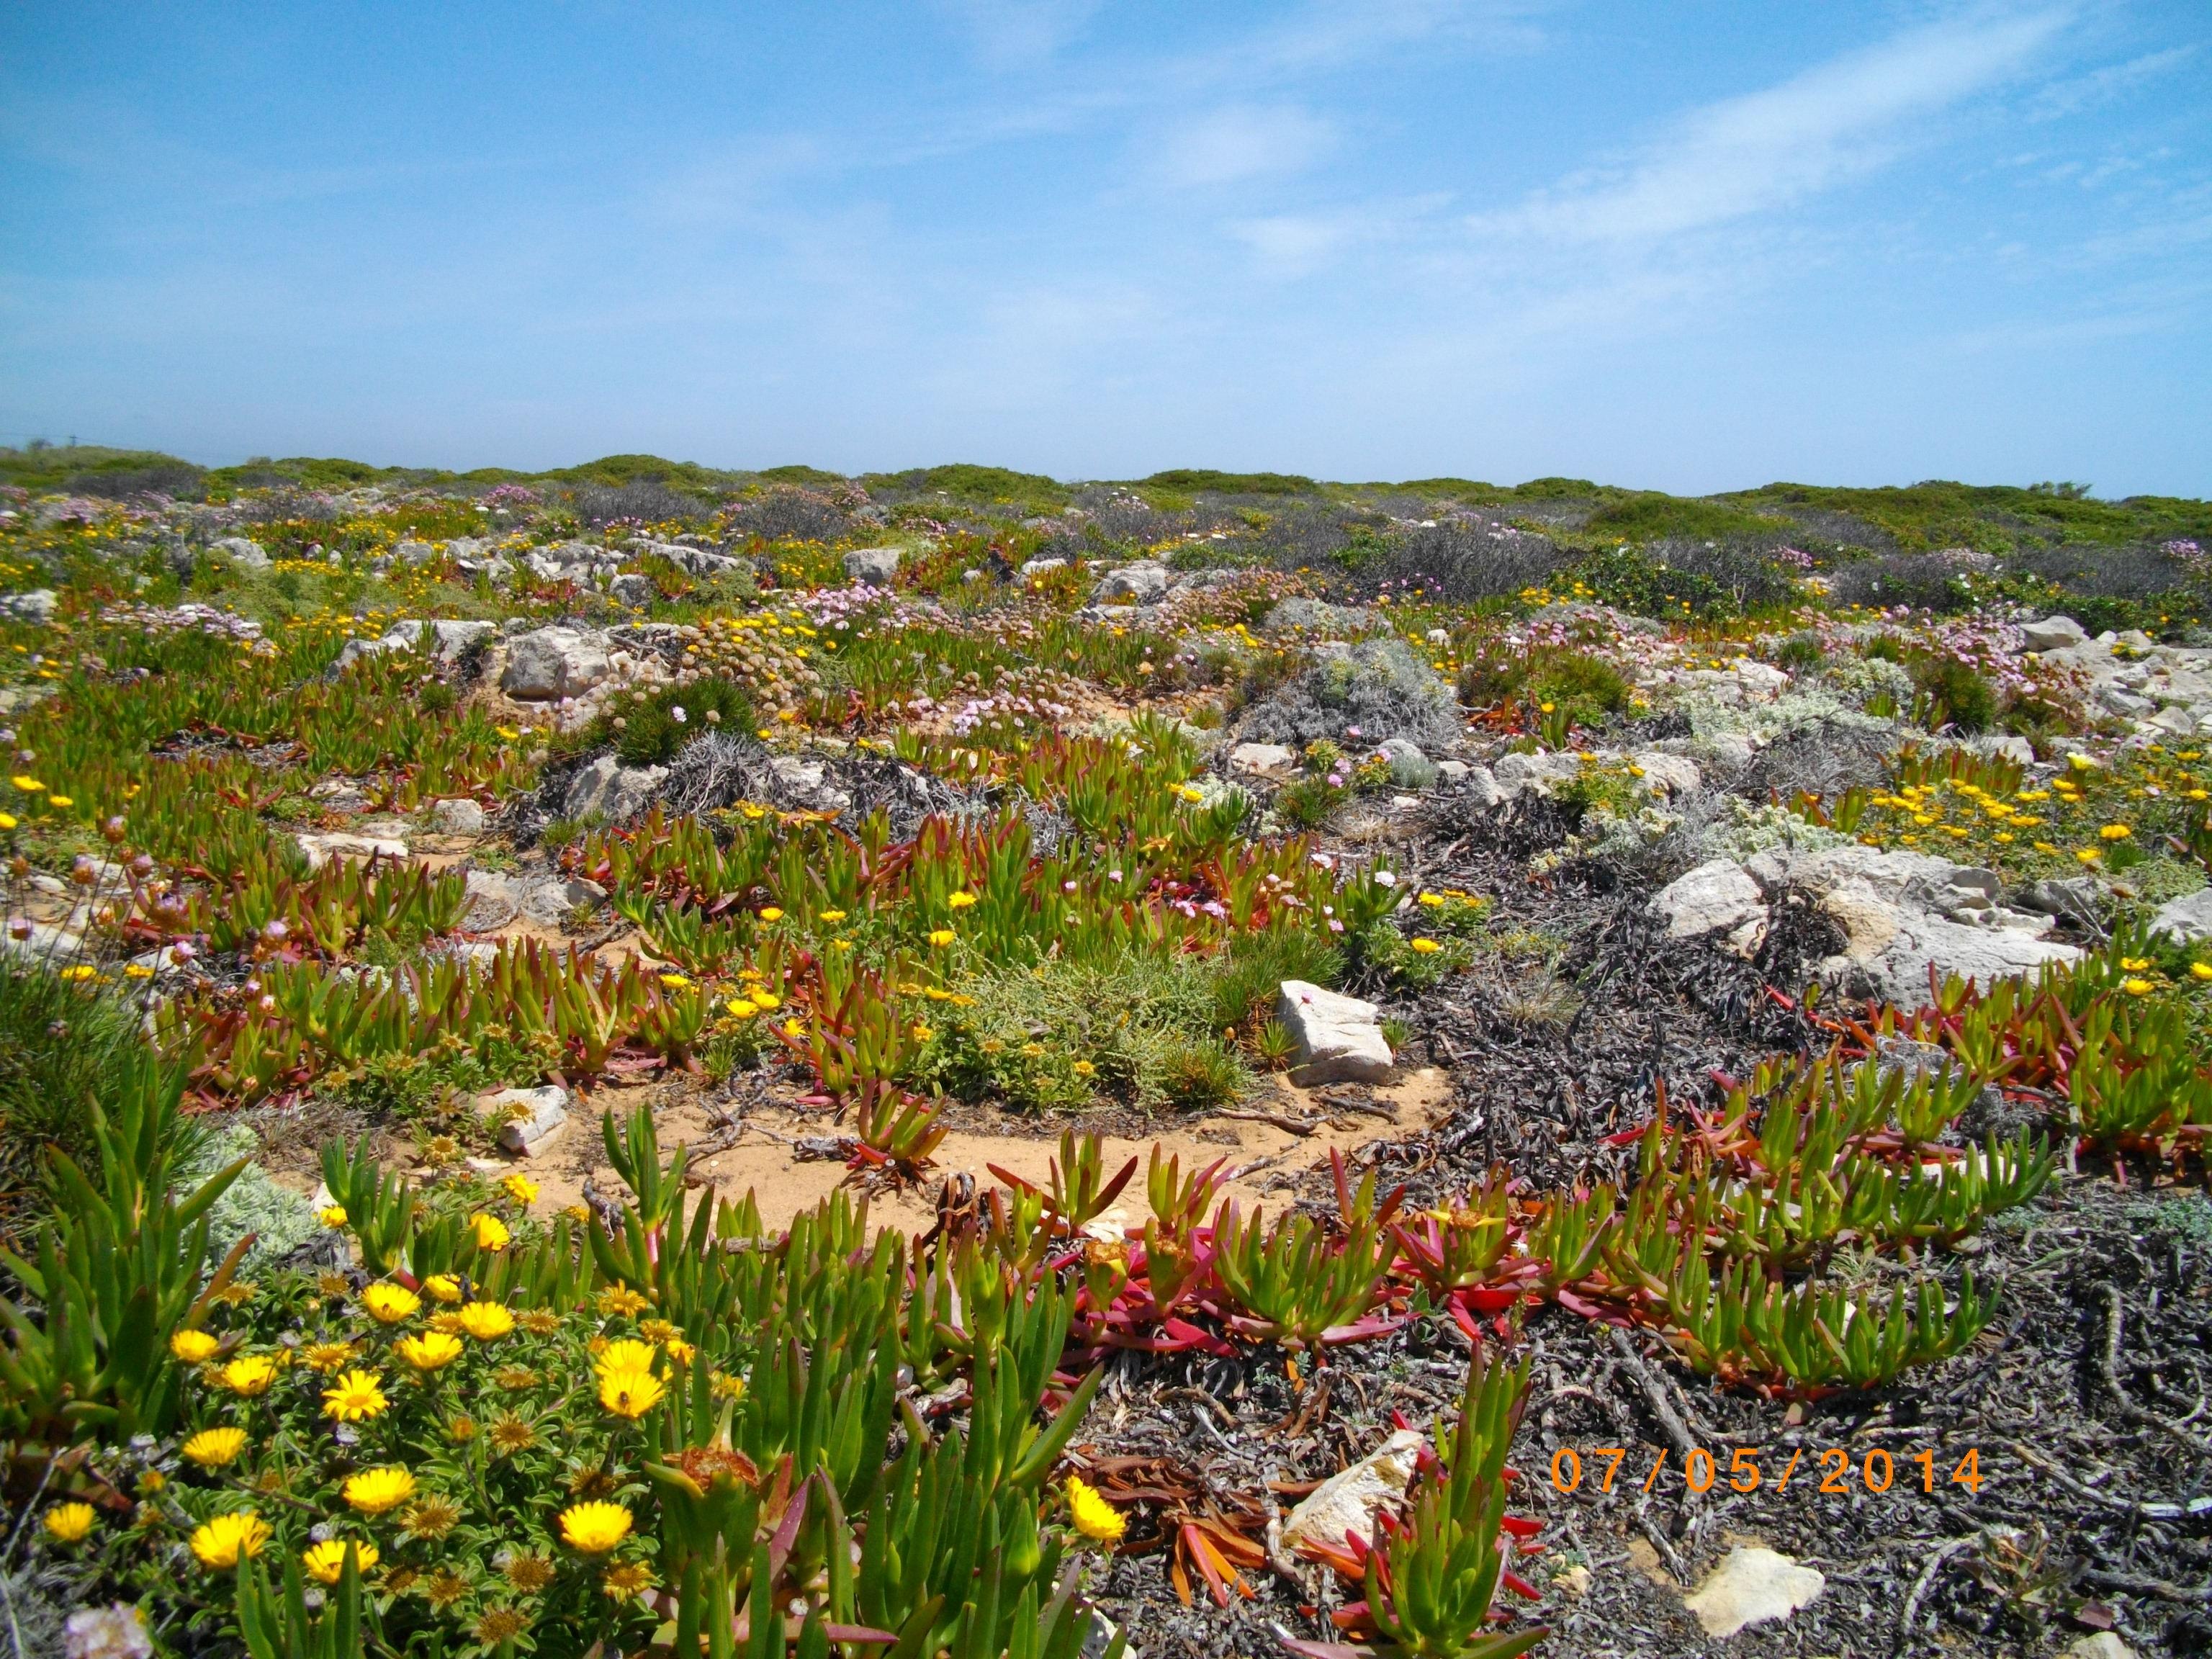 Free Images Landscape Coast Nature Grass Wilderness - Portugal vegetation map